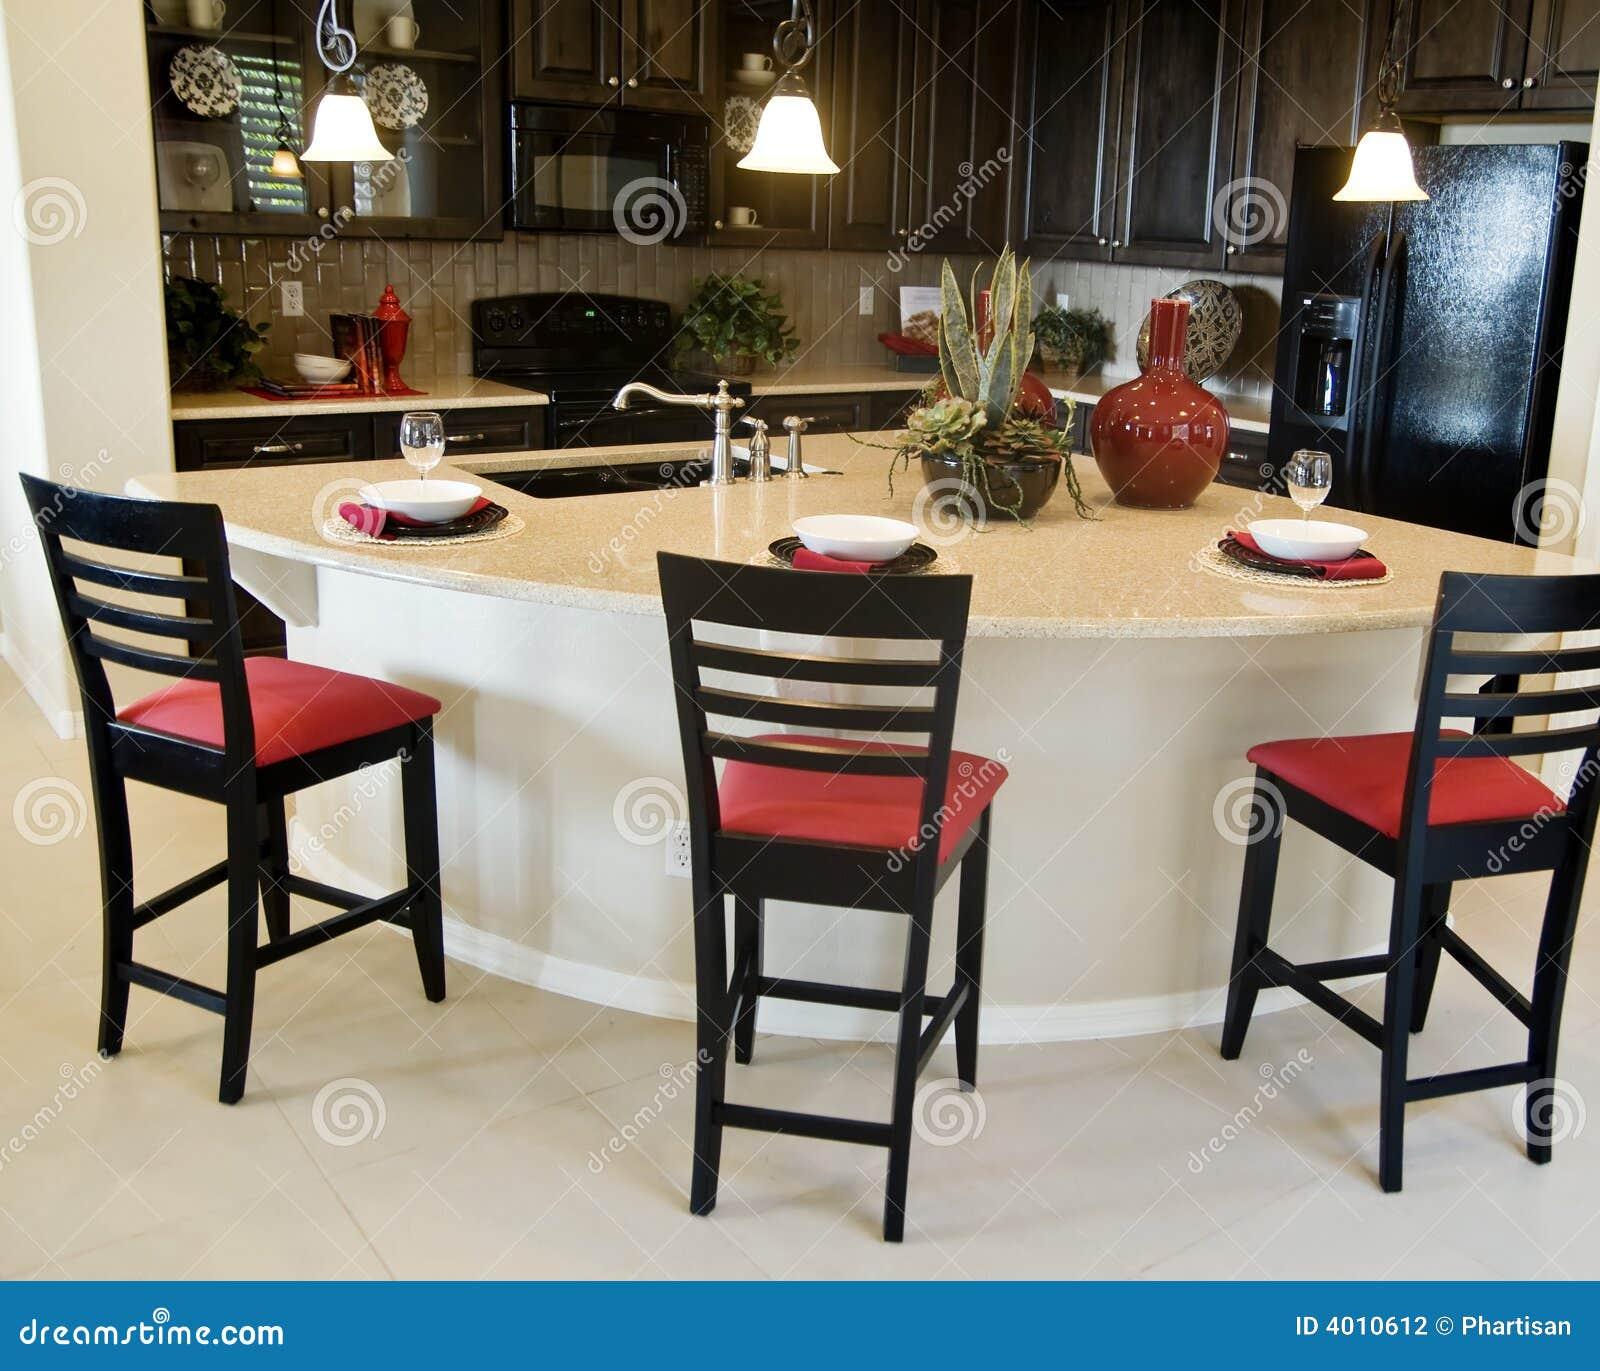 diseo interior de la cocina moderna with diseos de cocina modernas